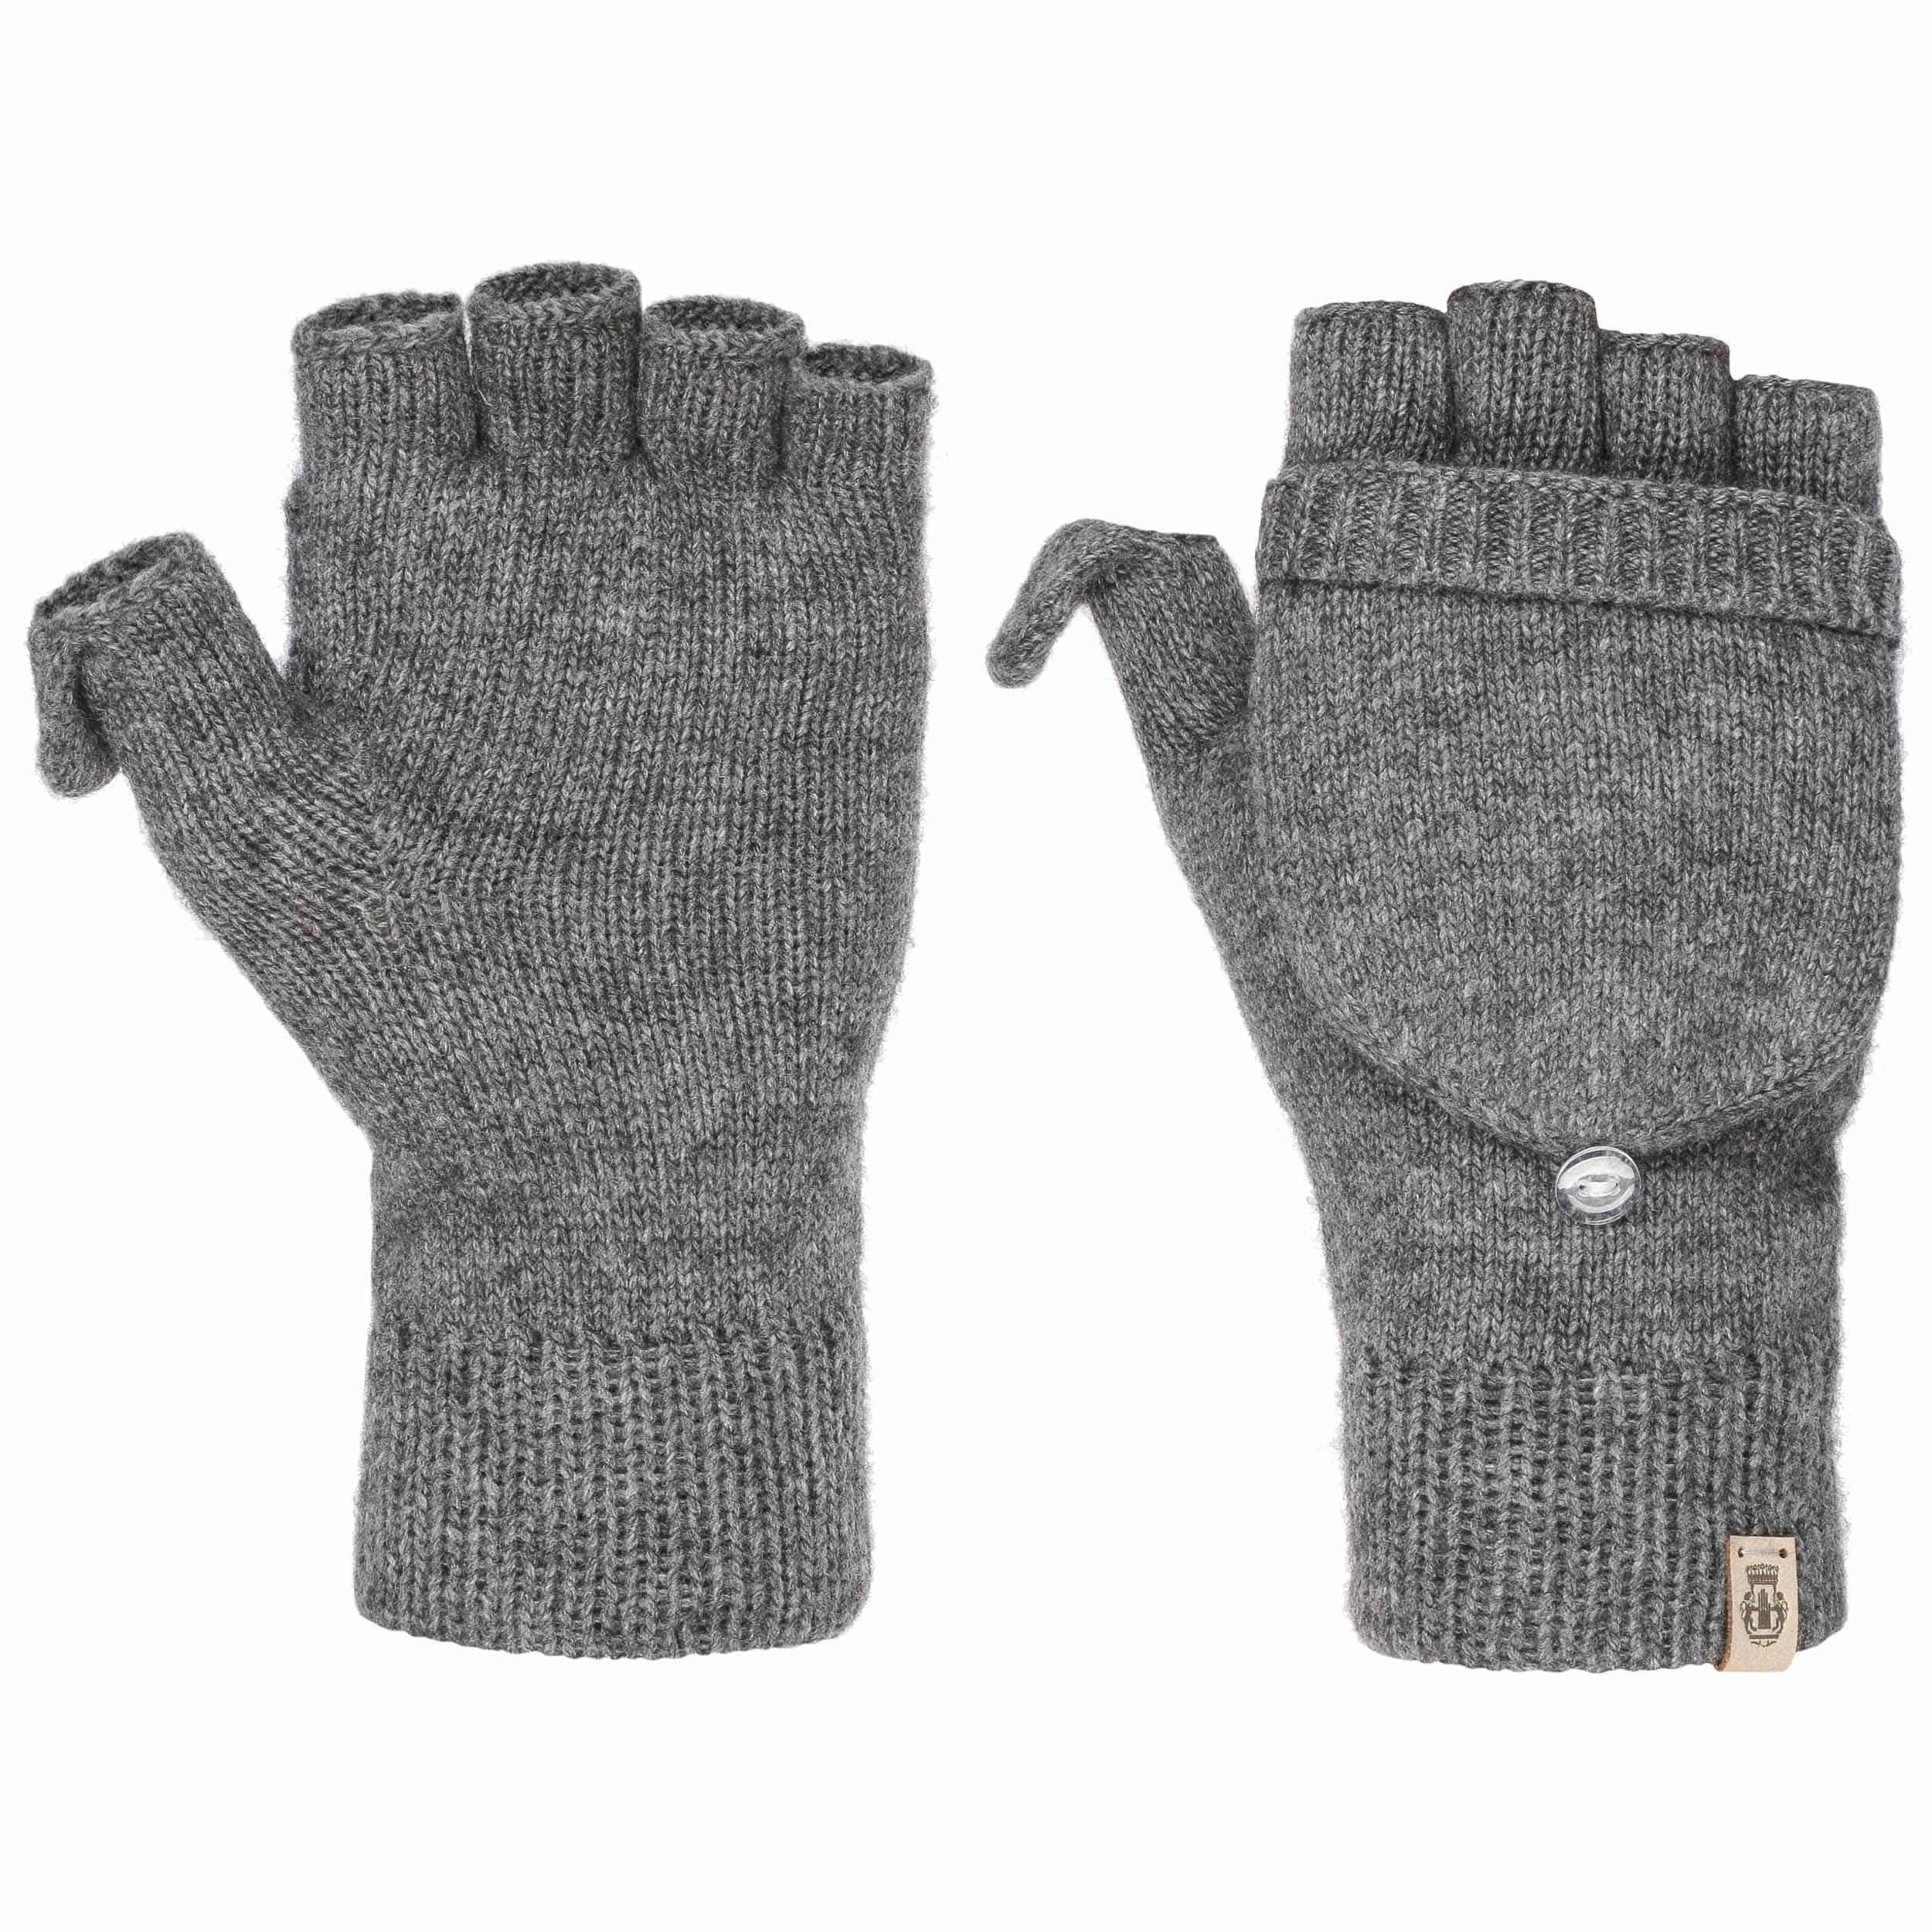 Fingerlose Handschuhe Merino by Roeckl